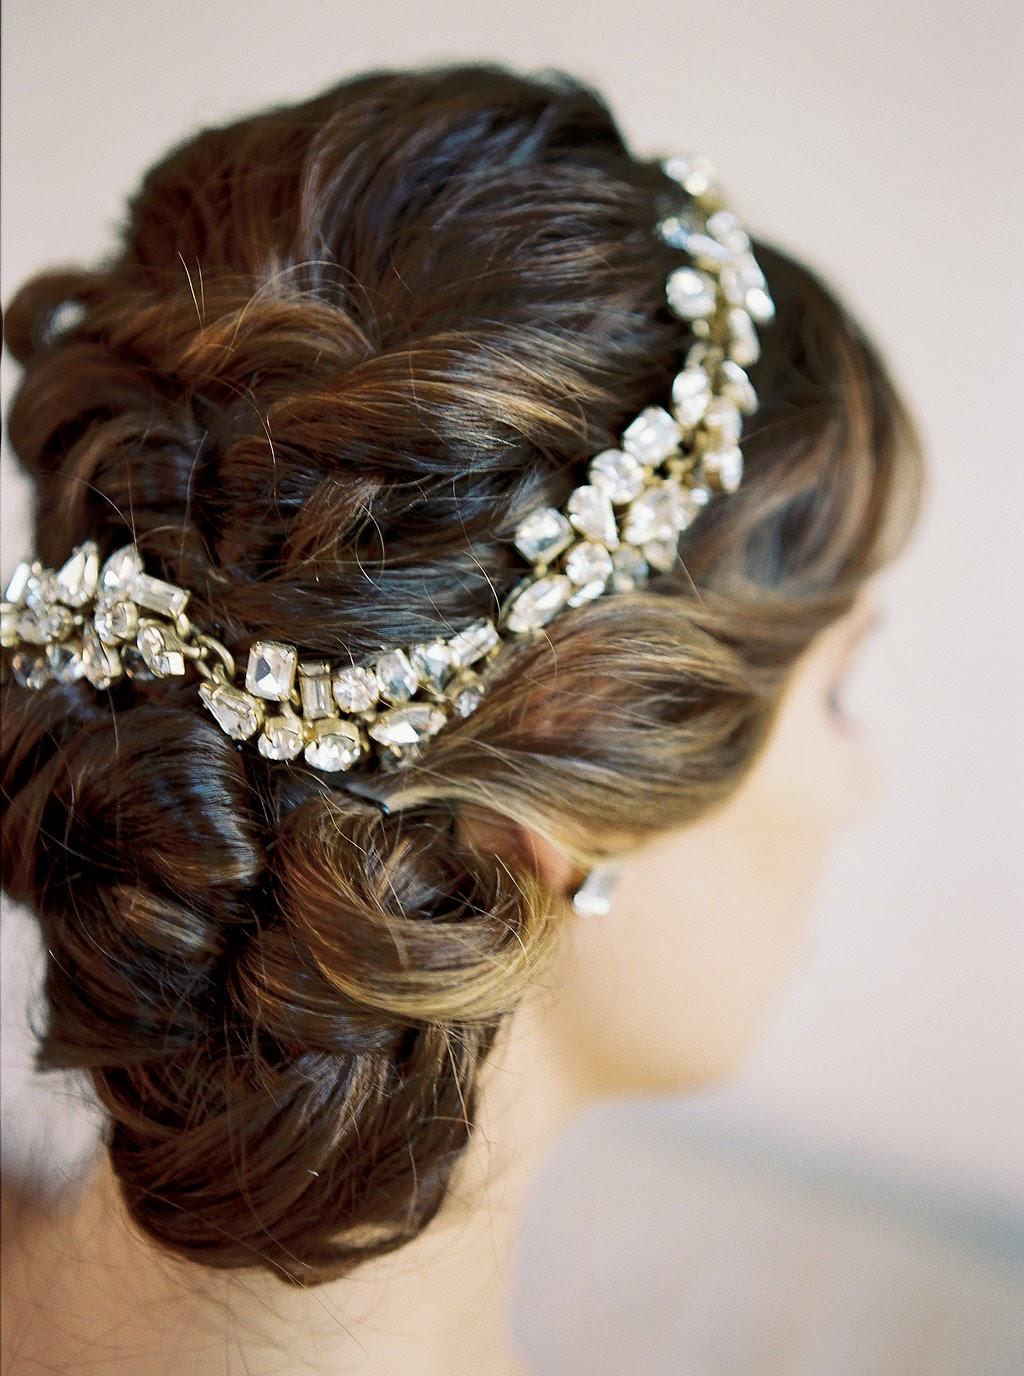 Alexandra-Elise-Photography-Ali-Reed-Film-Wedding-Photographer-149.jpg